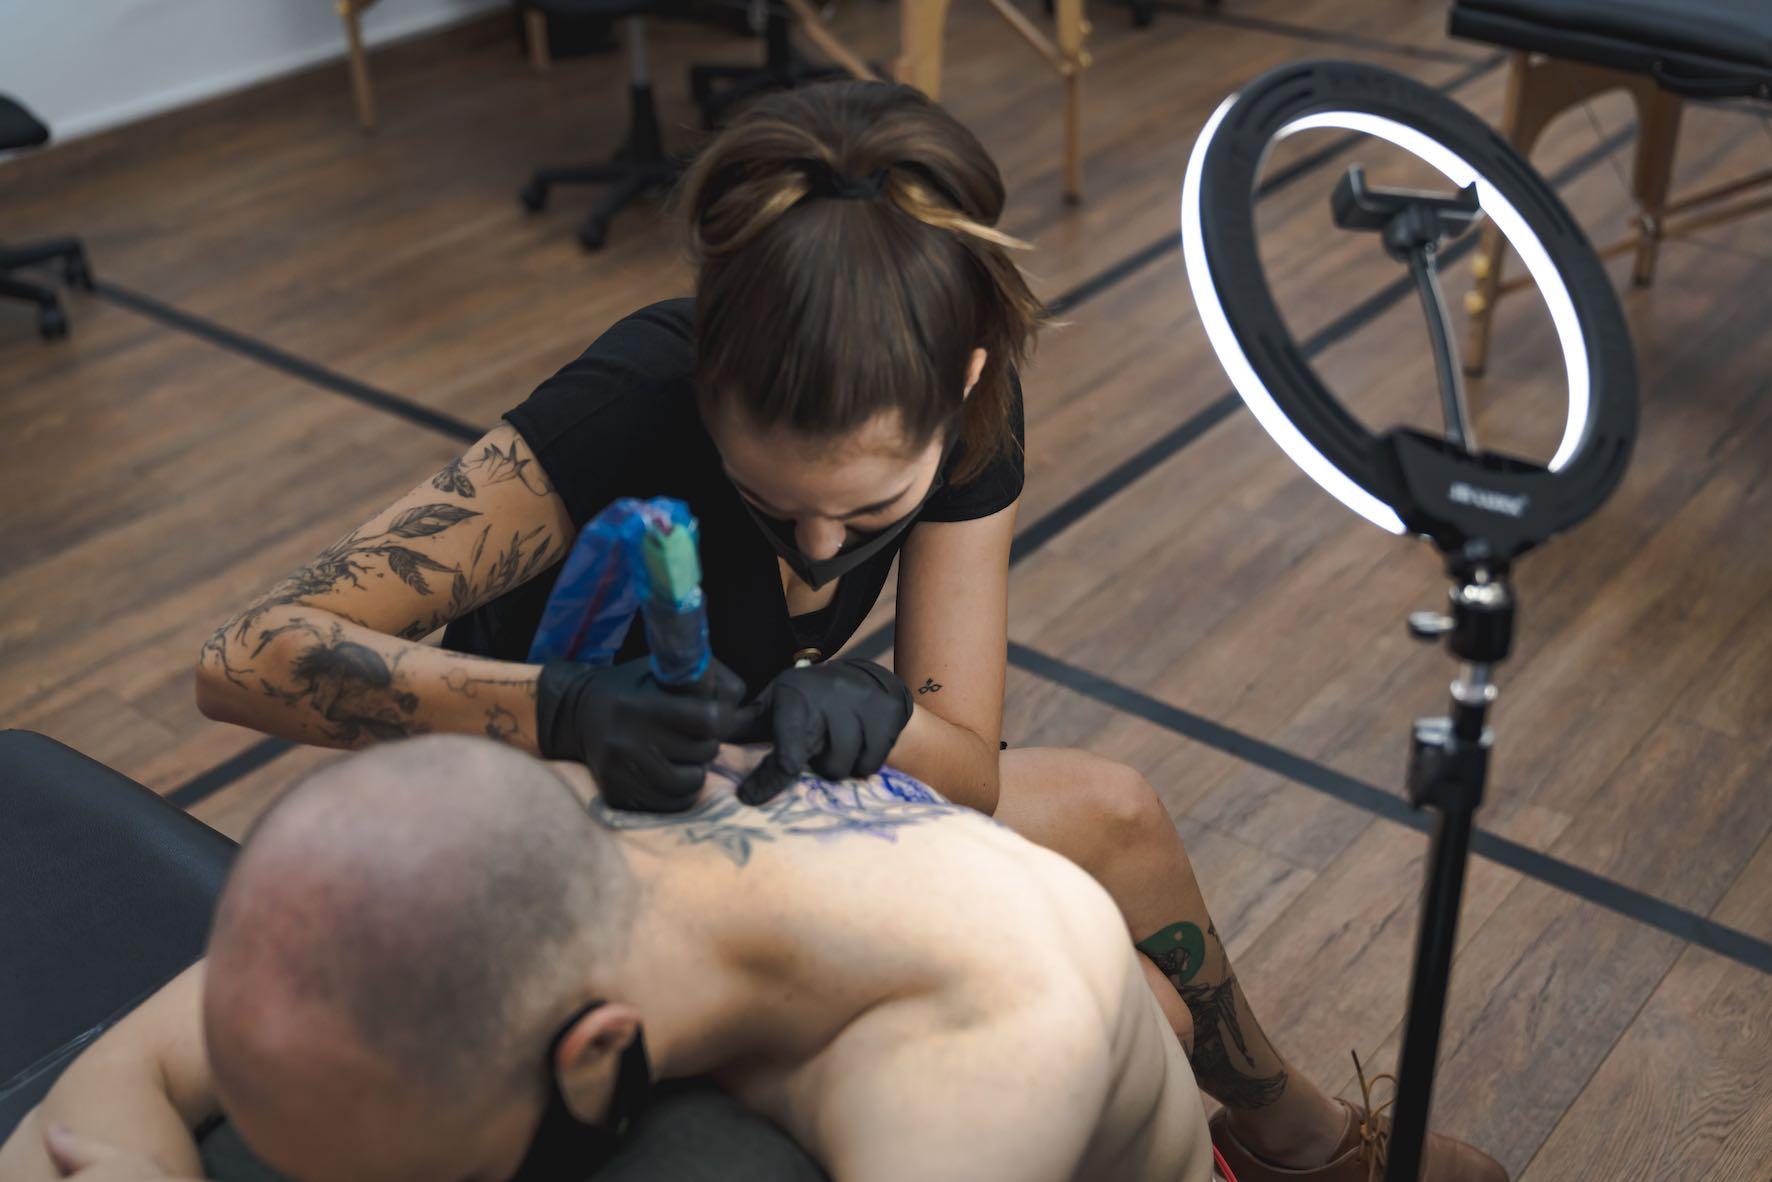 Introducing tattoo artist Alyssa van der Merwe